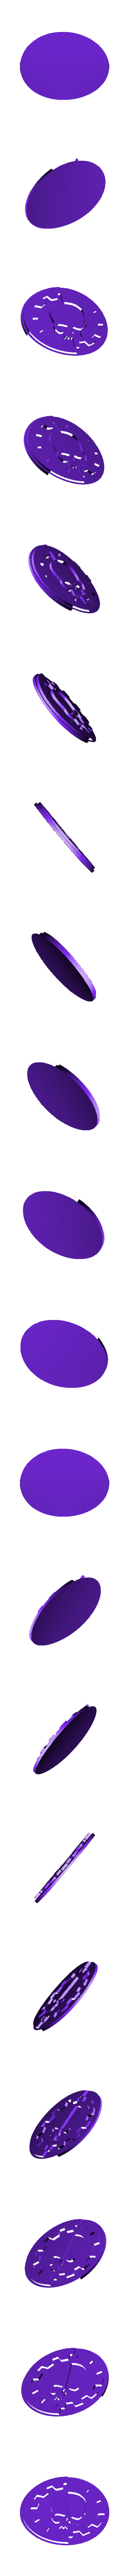 ADEPTUS_MECHANICUS_SYMBOL.stl Download free STL file Logo Pack - Carapace • Design to 3D print, yaemhay